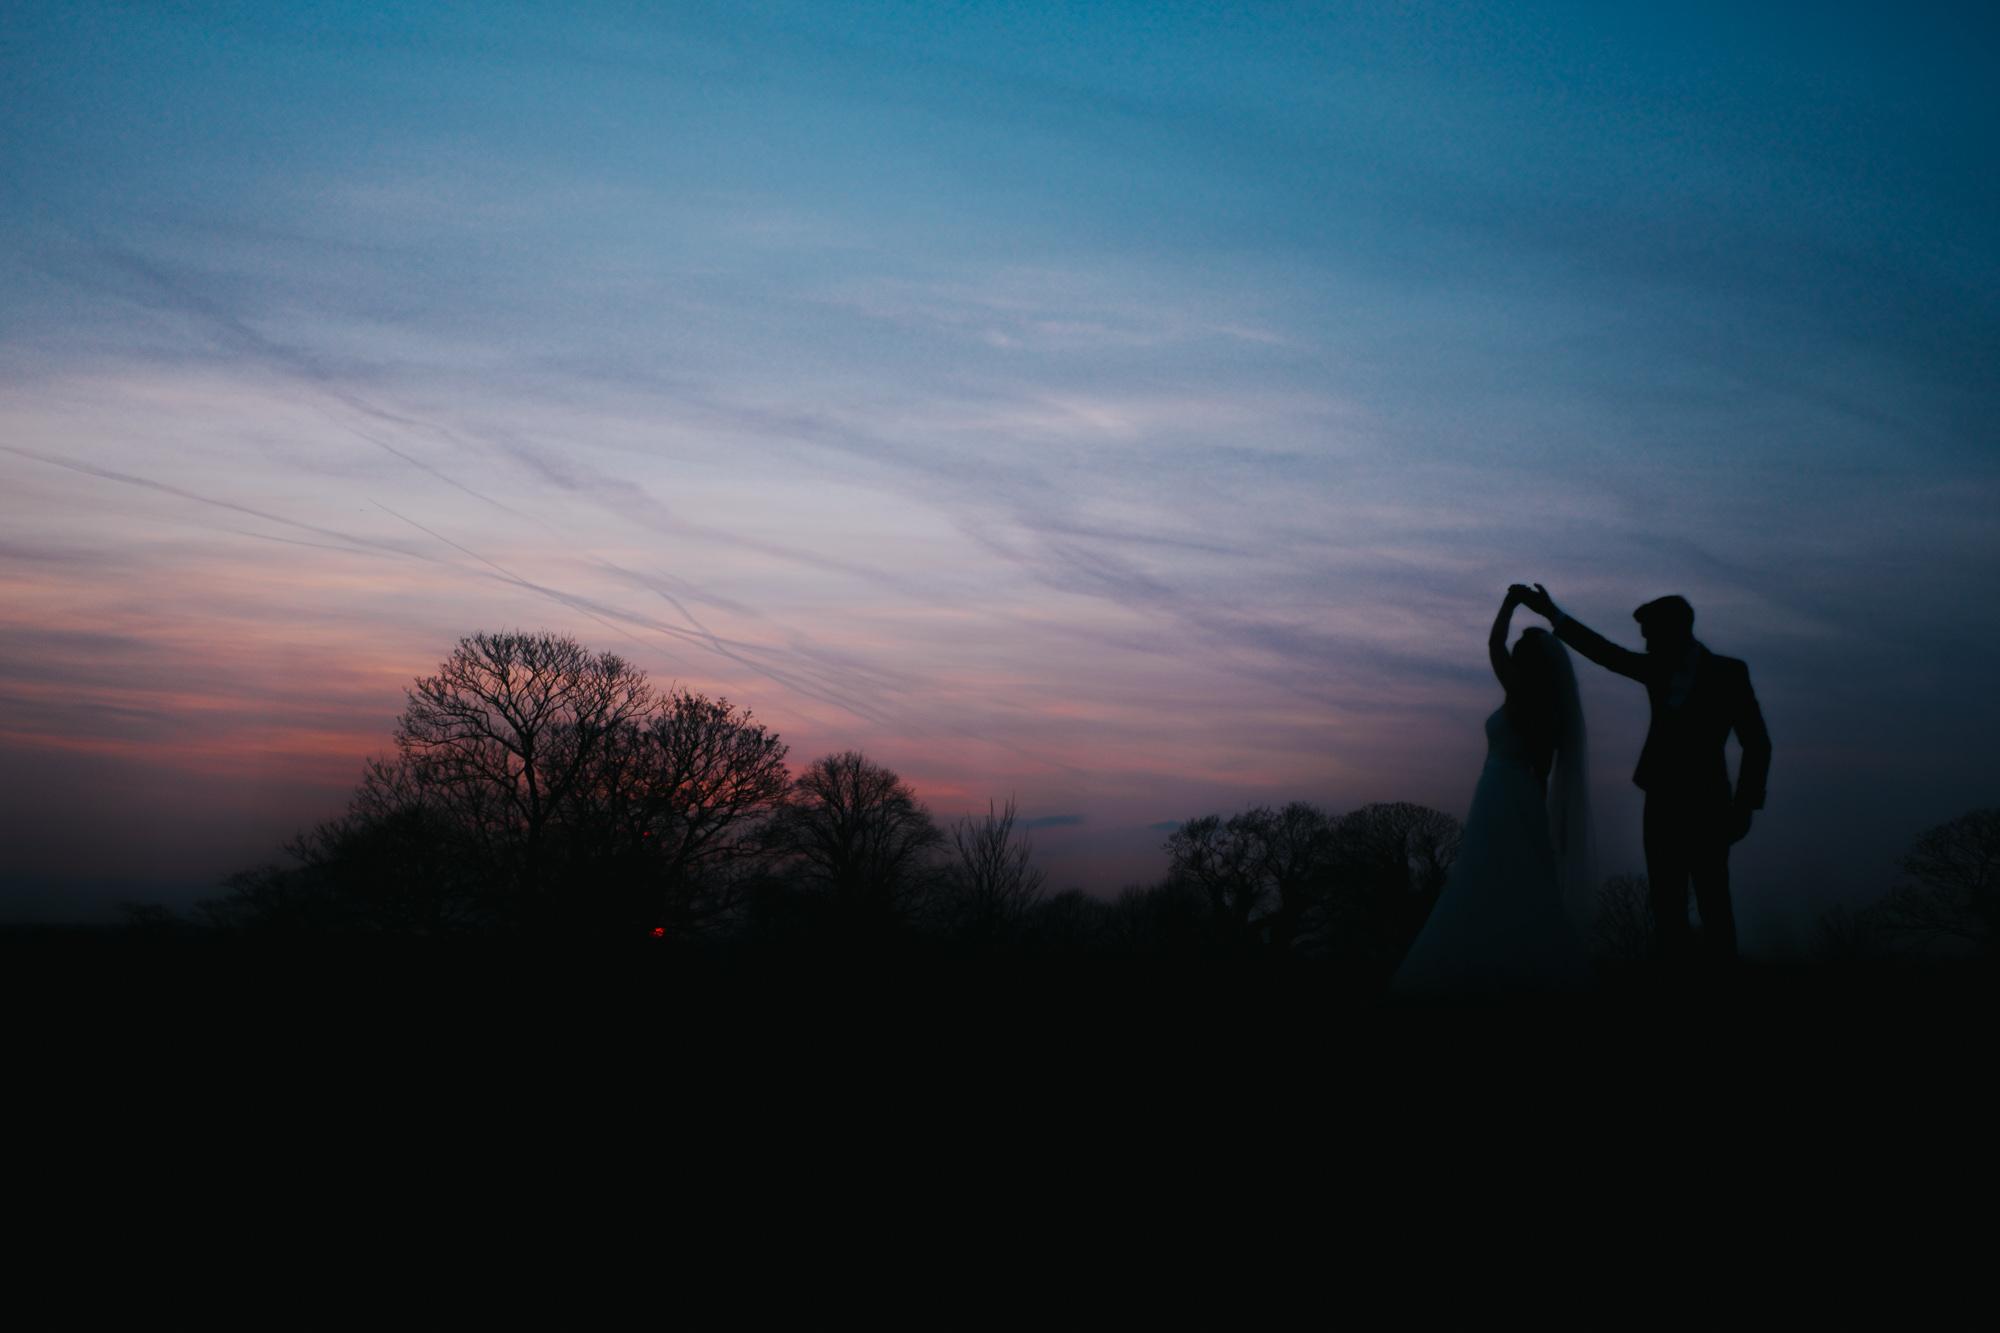 West Tower Exclusive Wedding Venue wedding photography merseyside and lancashire wedding photographer (52 of 60).jpg